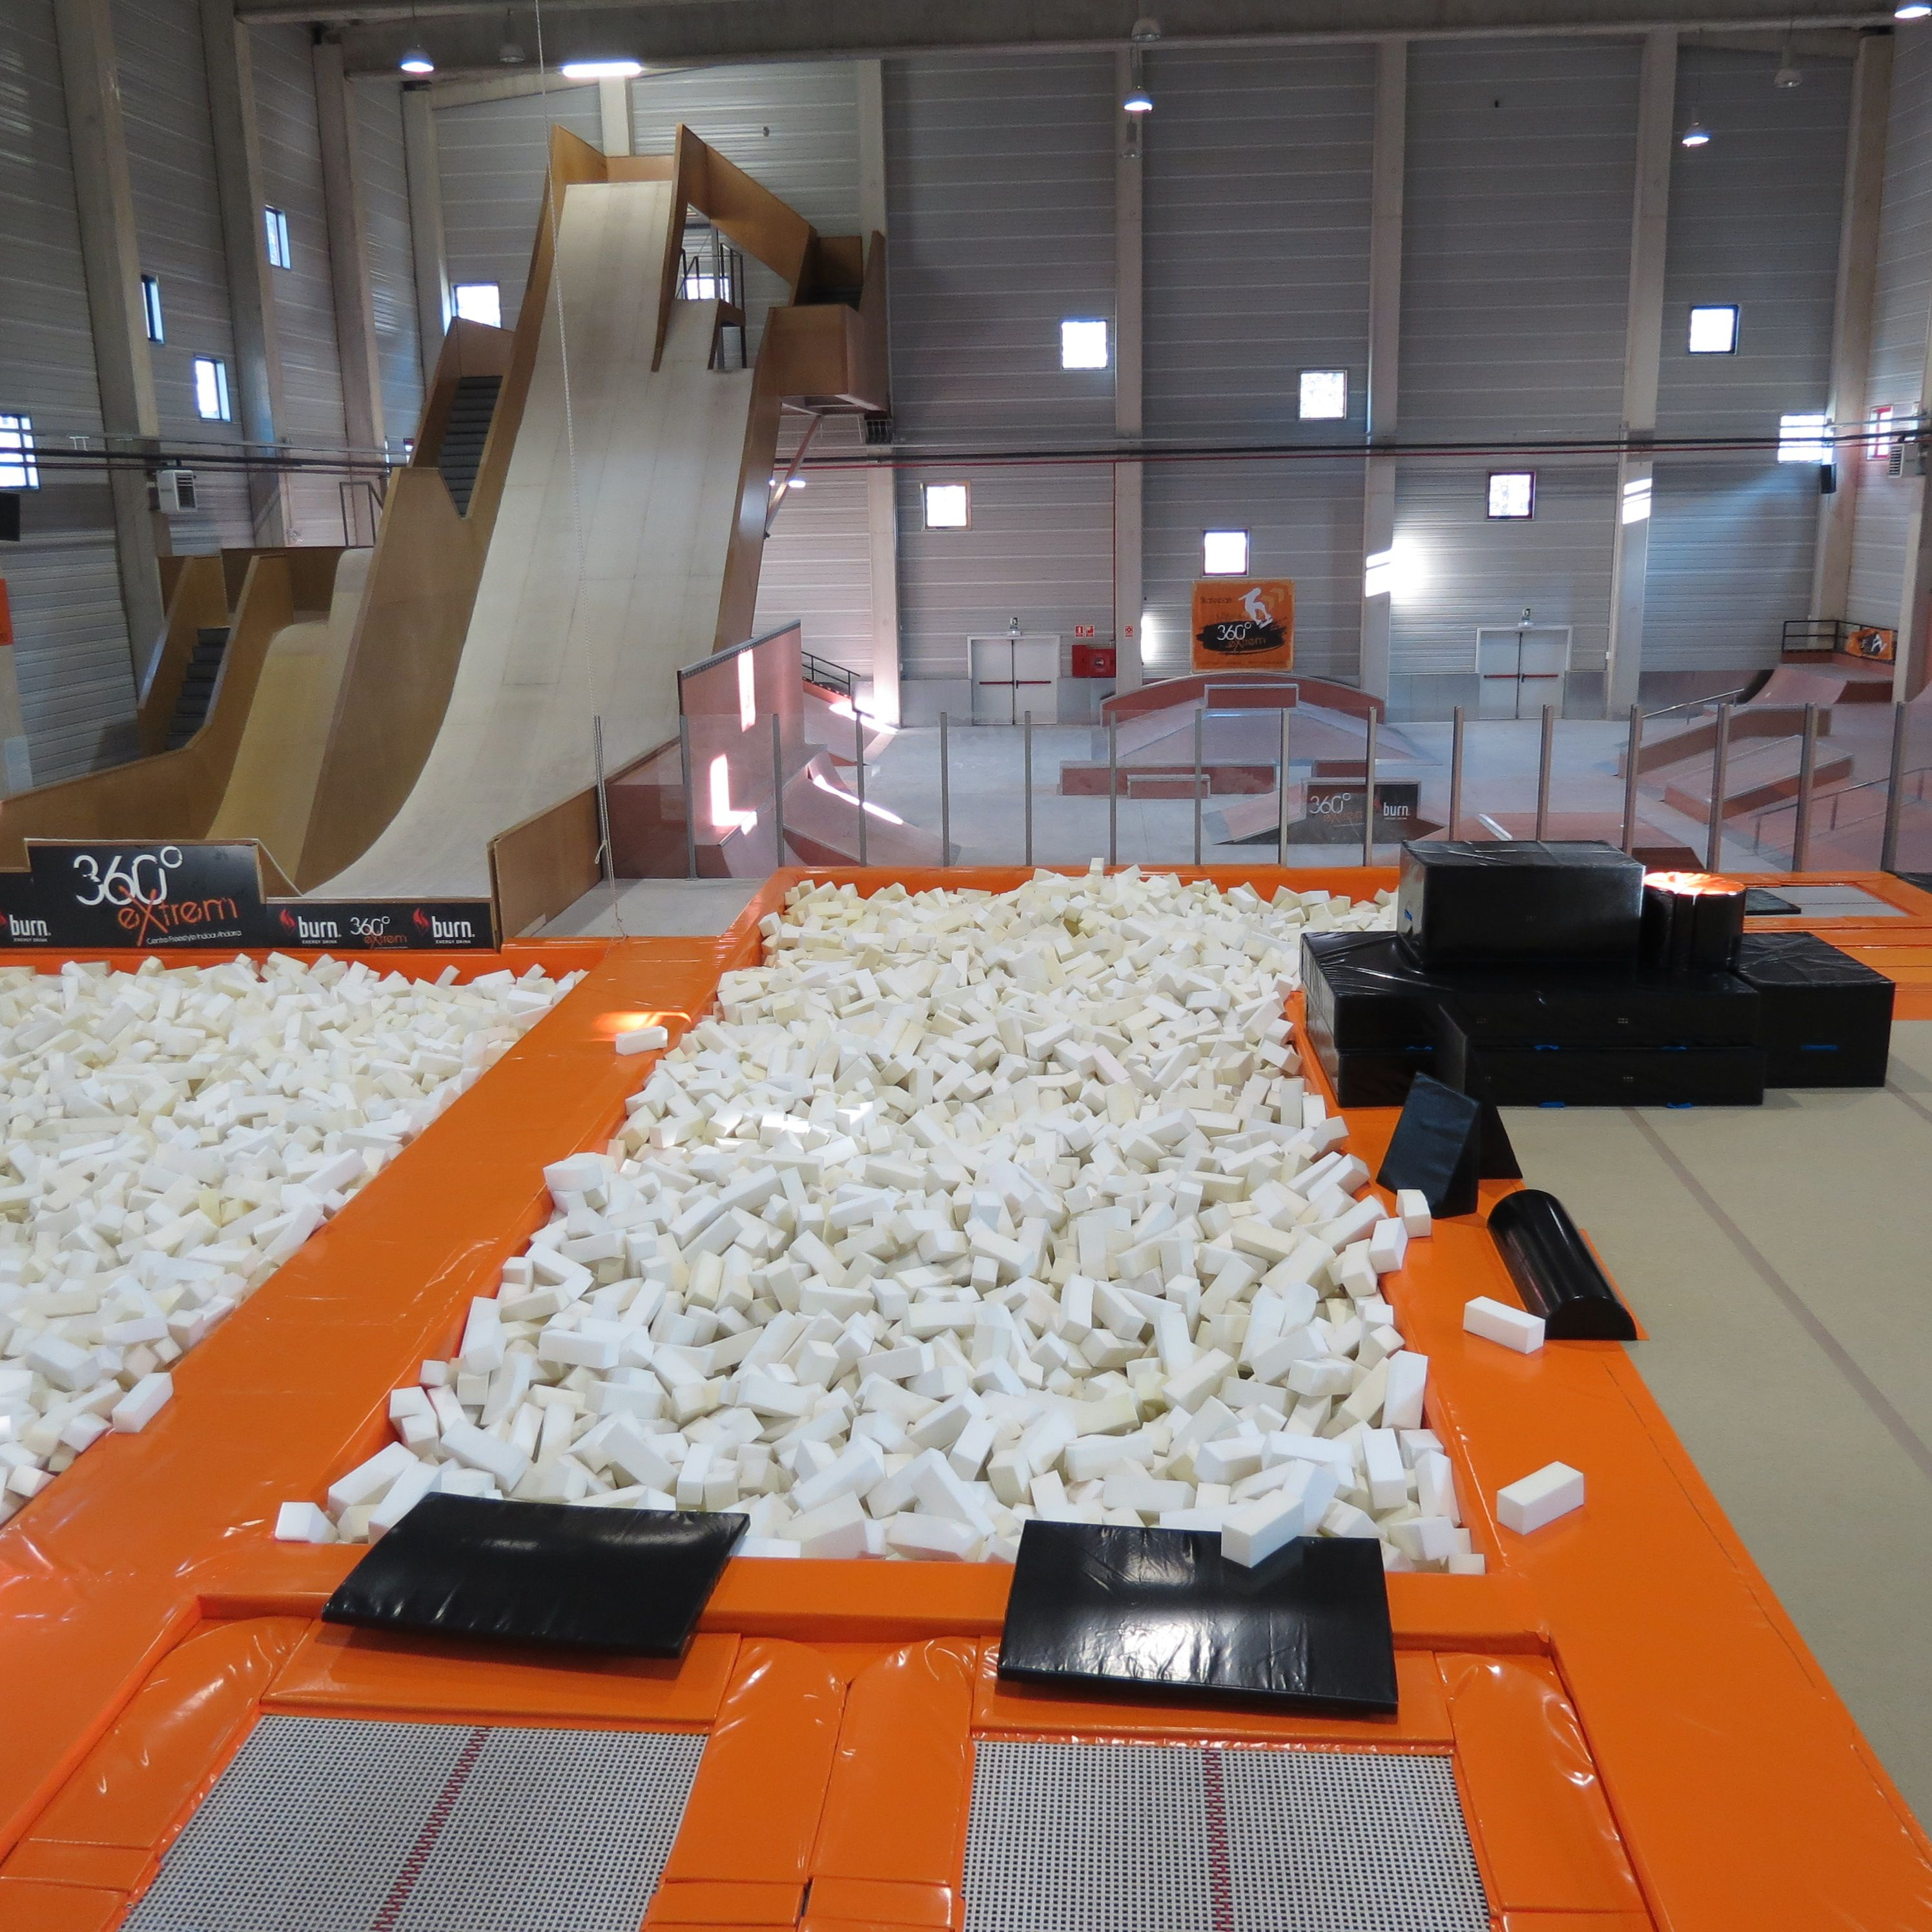 big jump trampolin foam pit artistic gymnastic floor for training all year freestyle. Black Bedroom Furniture Sets. Home Design Ideas